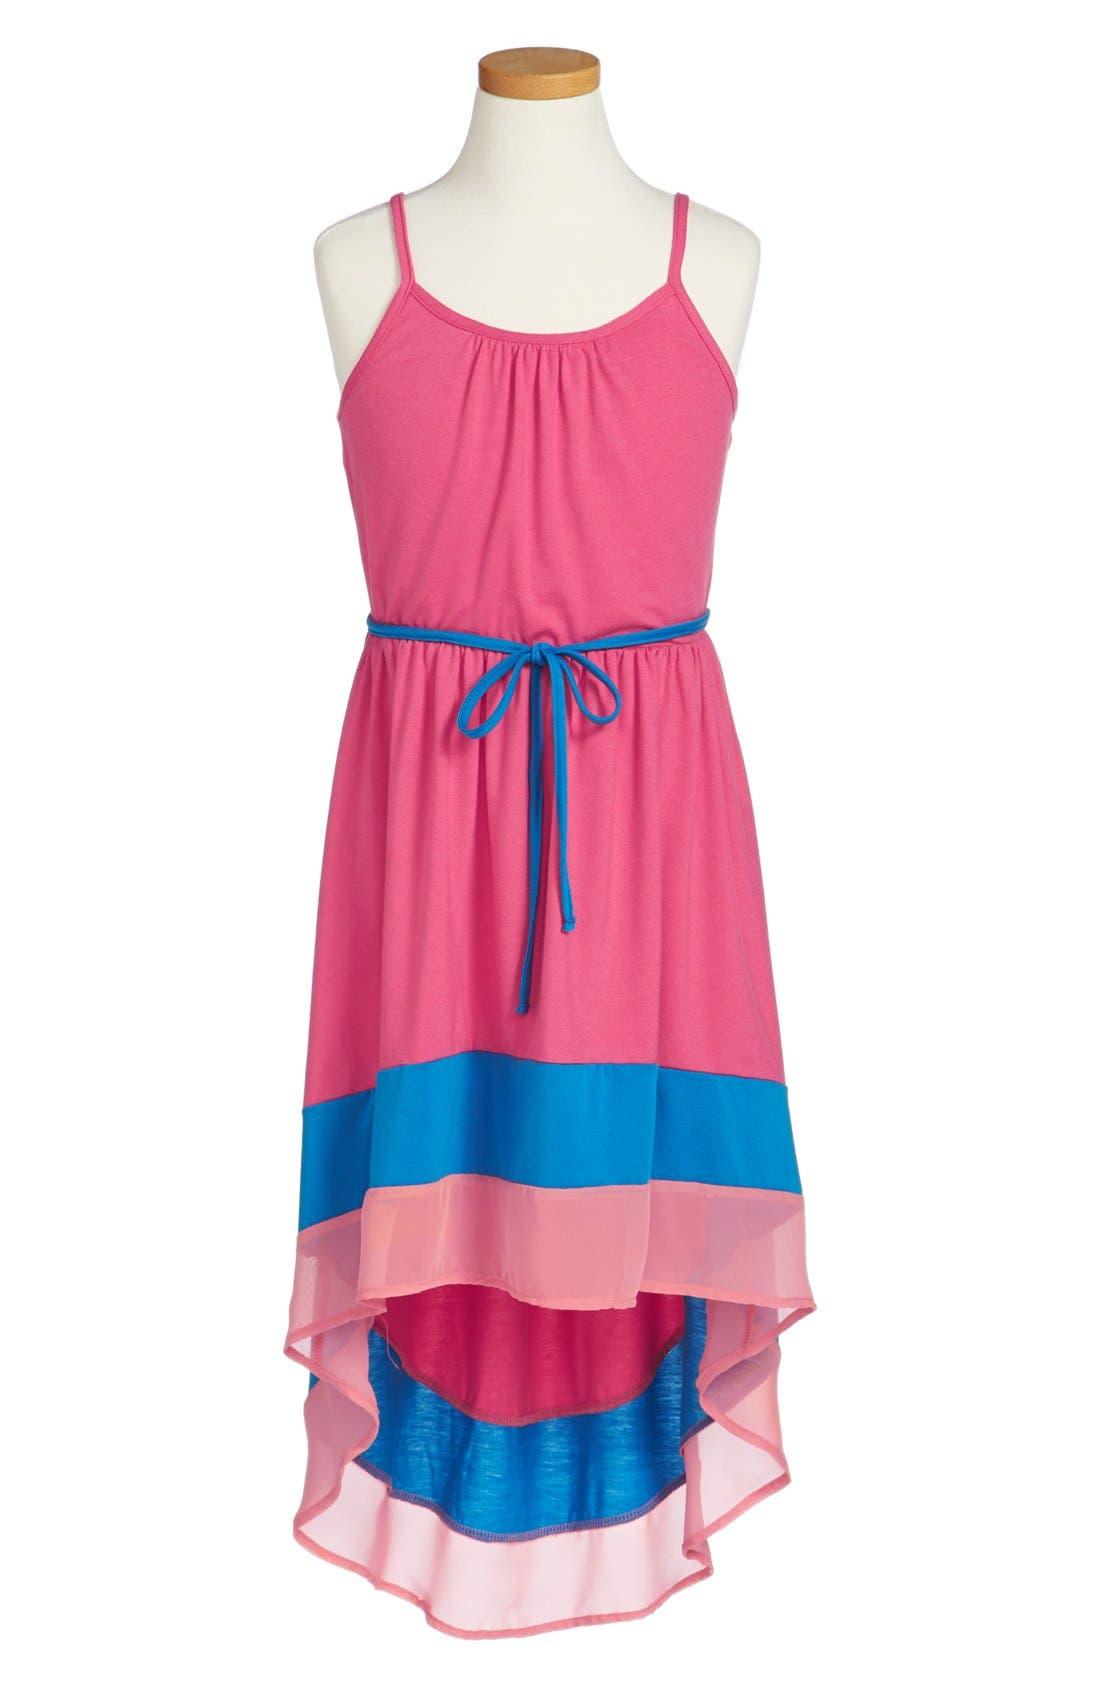 Main Image - Zunie Colorblock High/Low Dress (Big Girls)